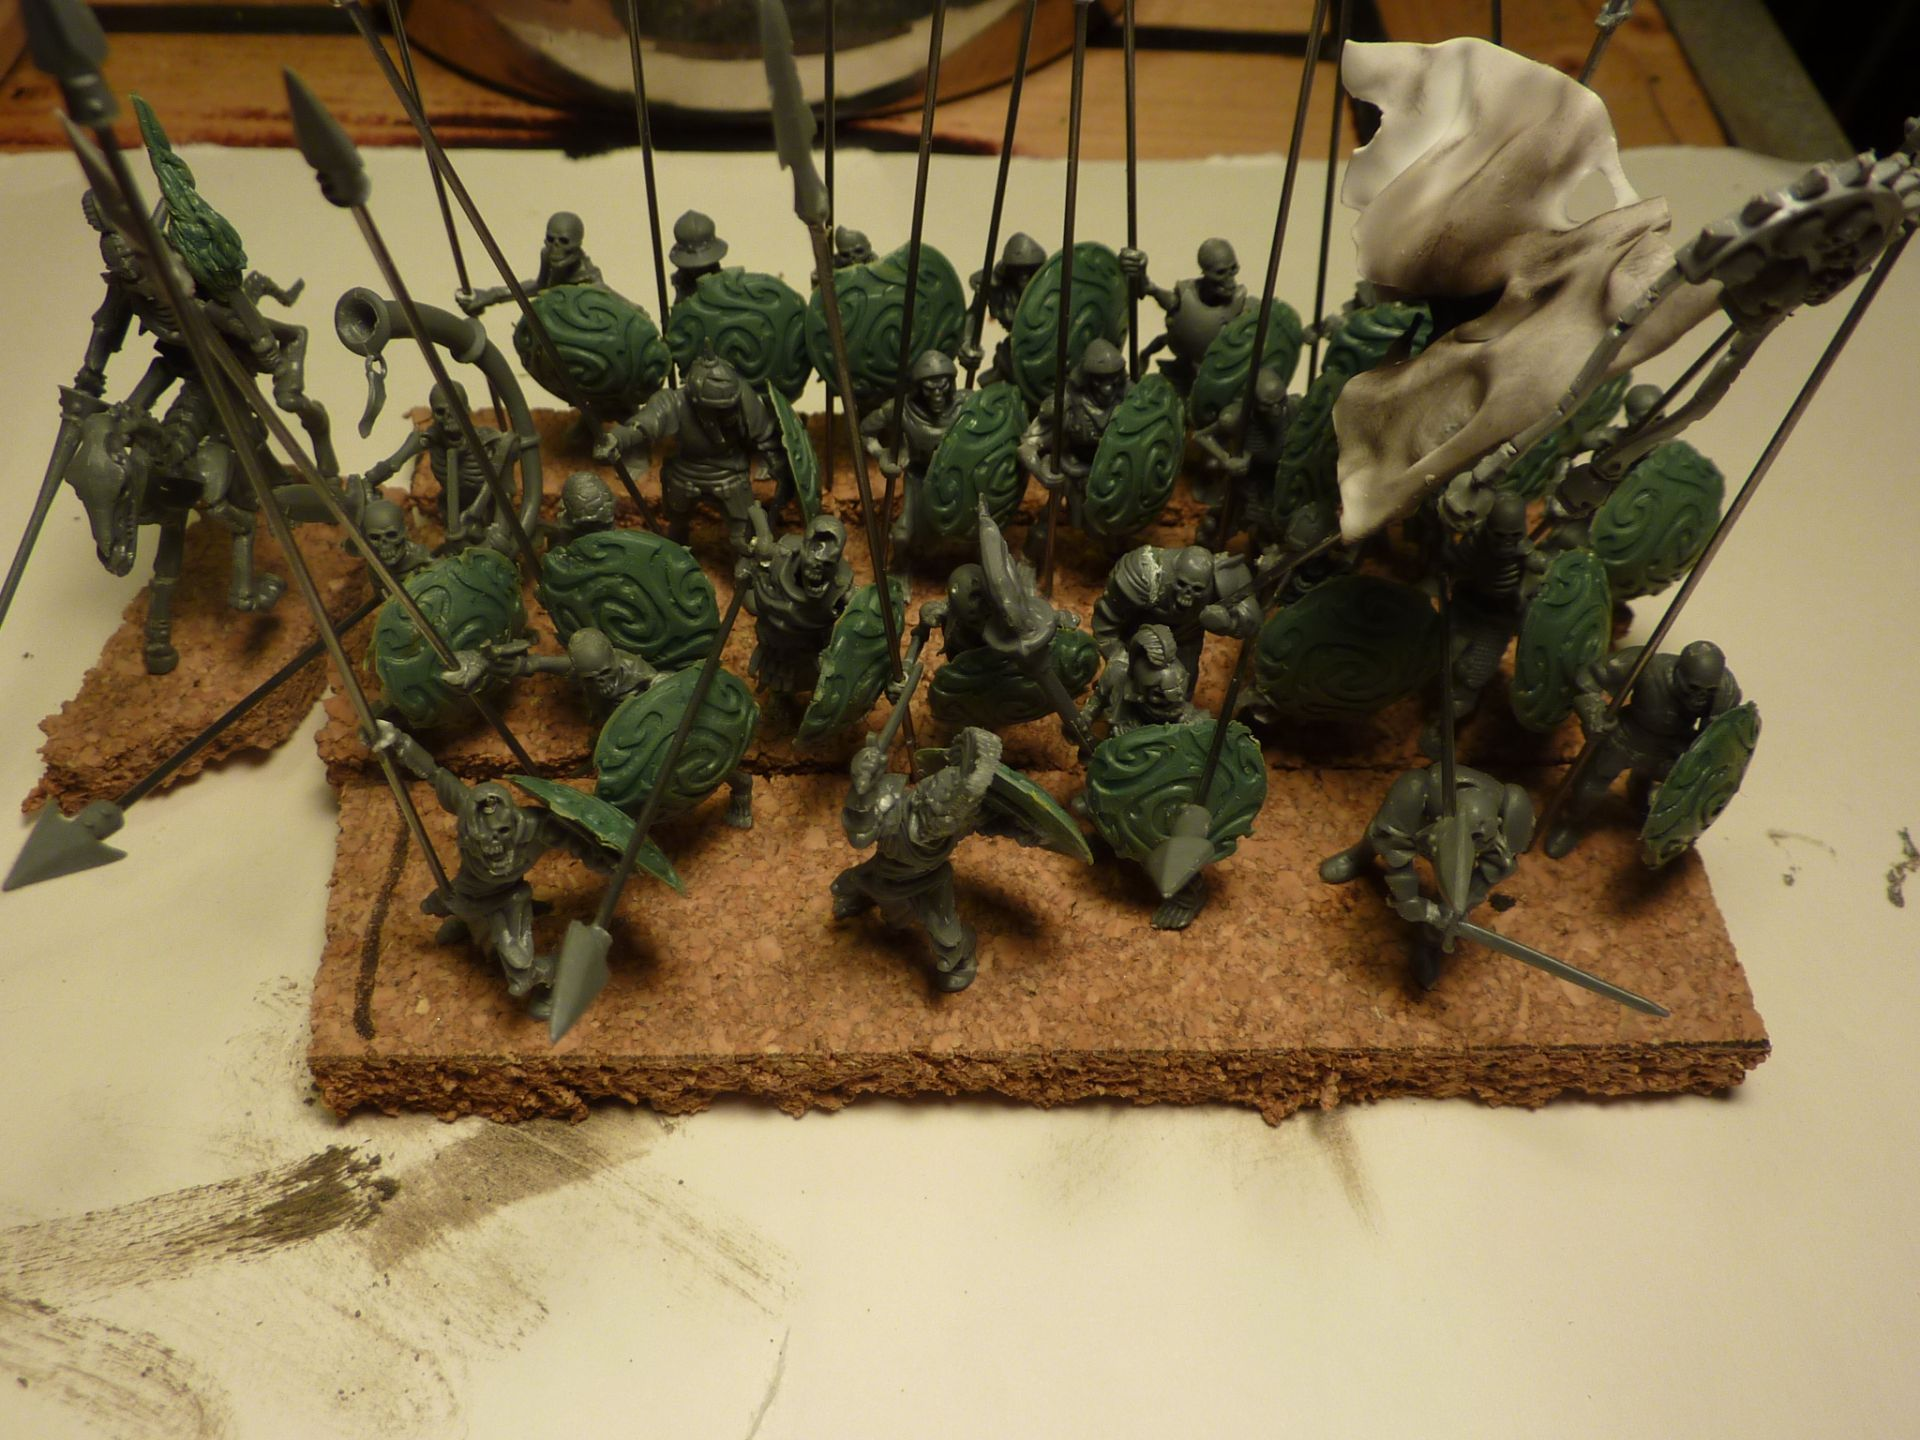 Armee de mort - vivant de Gab 56803e64dad84